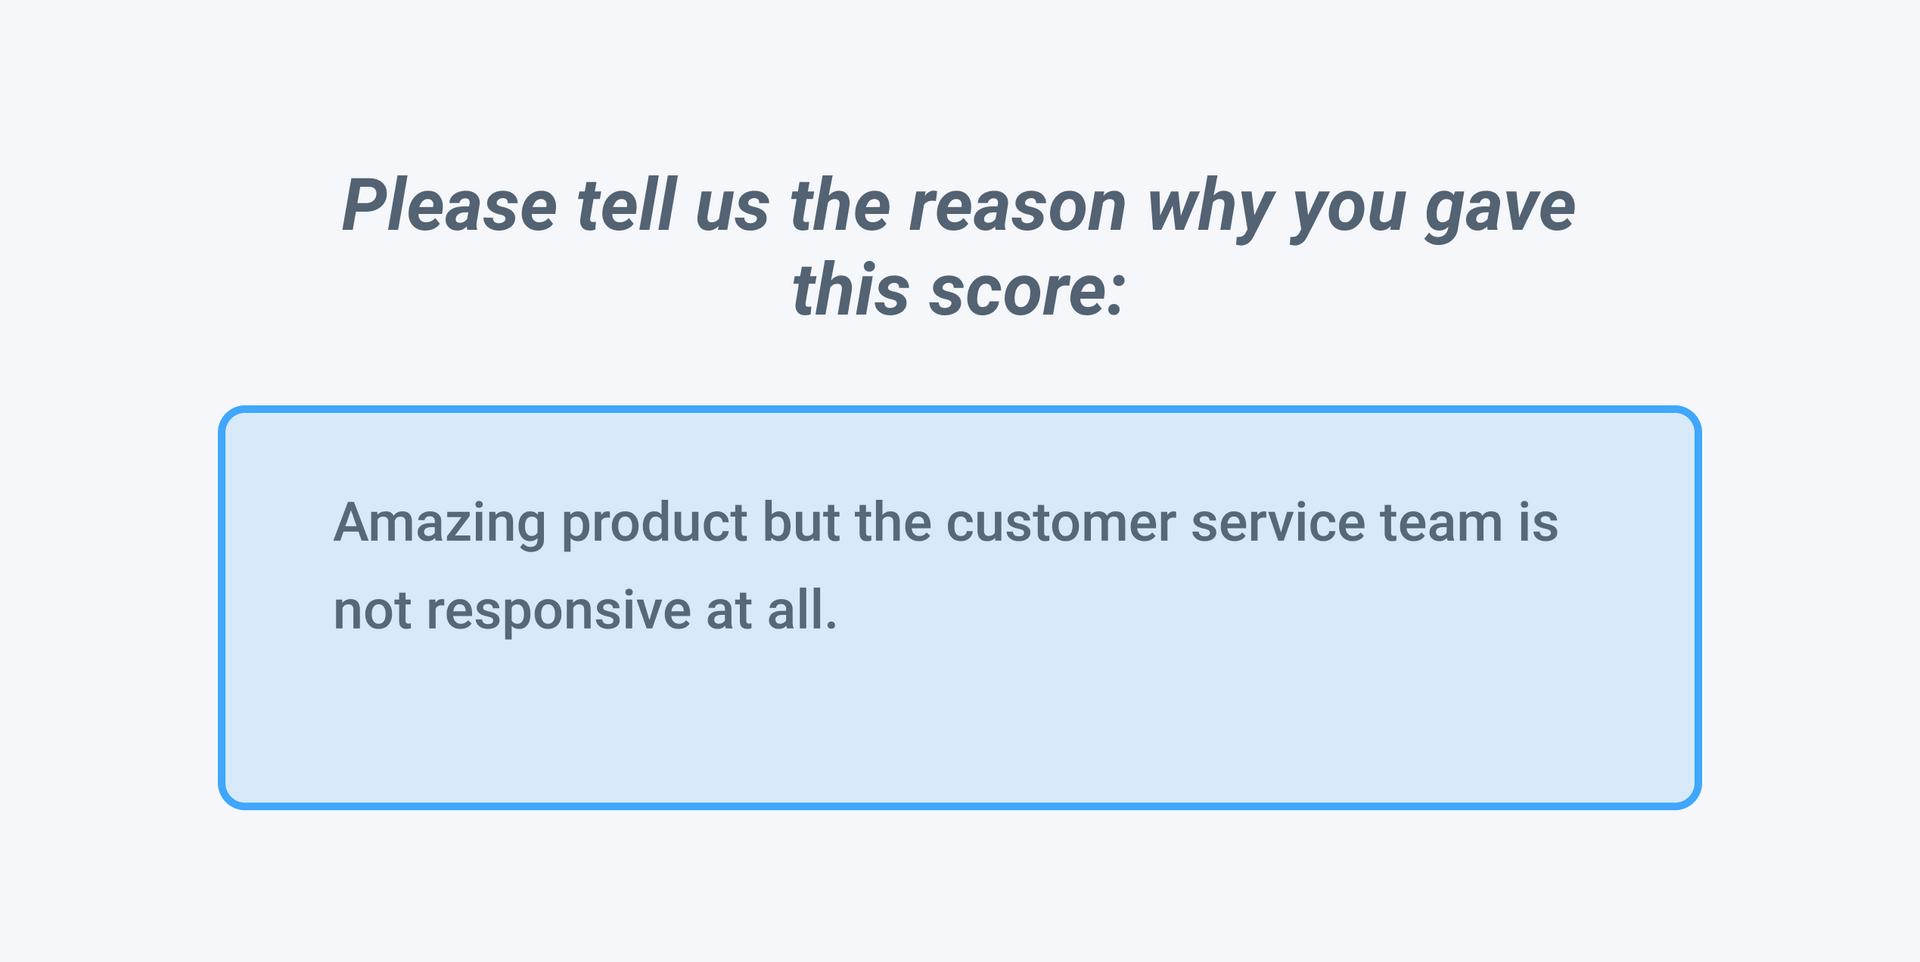 Net Promoter Score open ended question